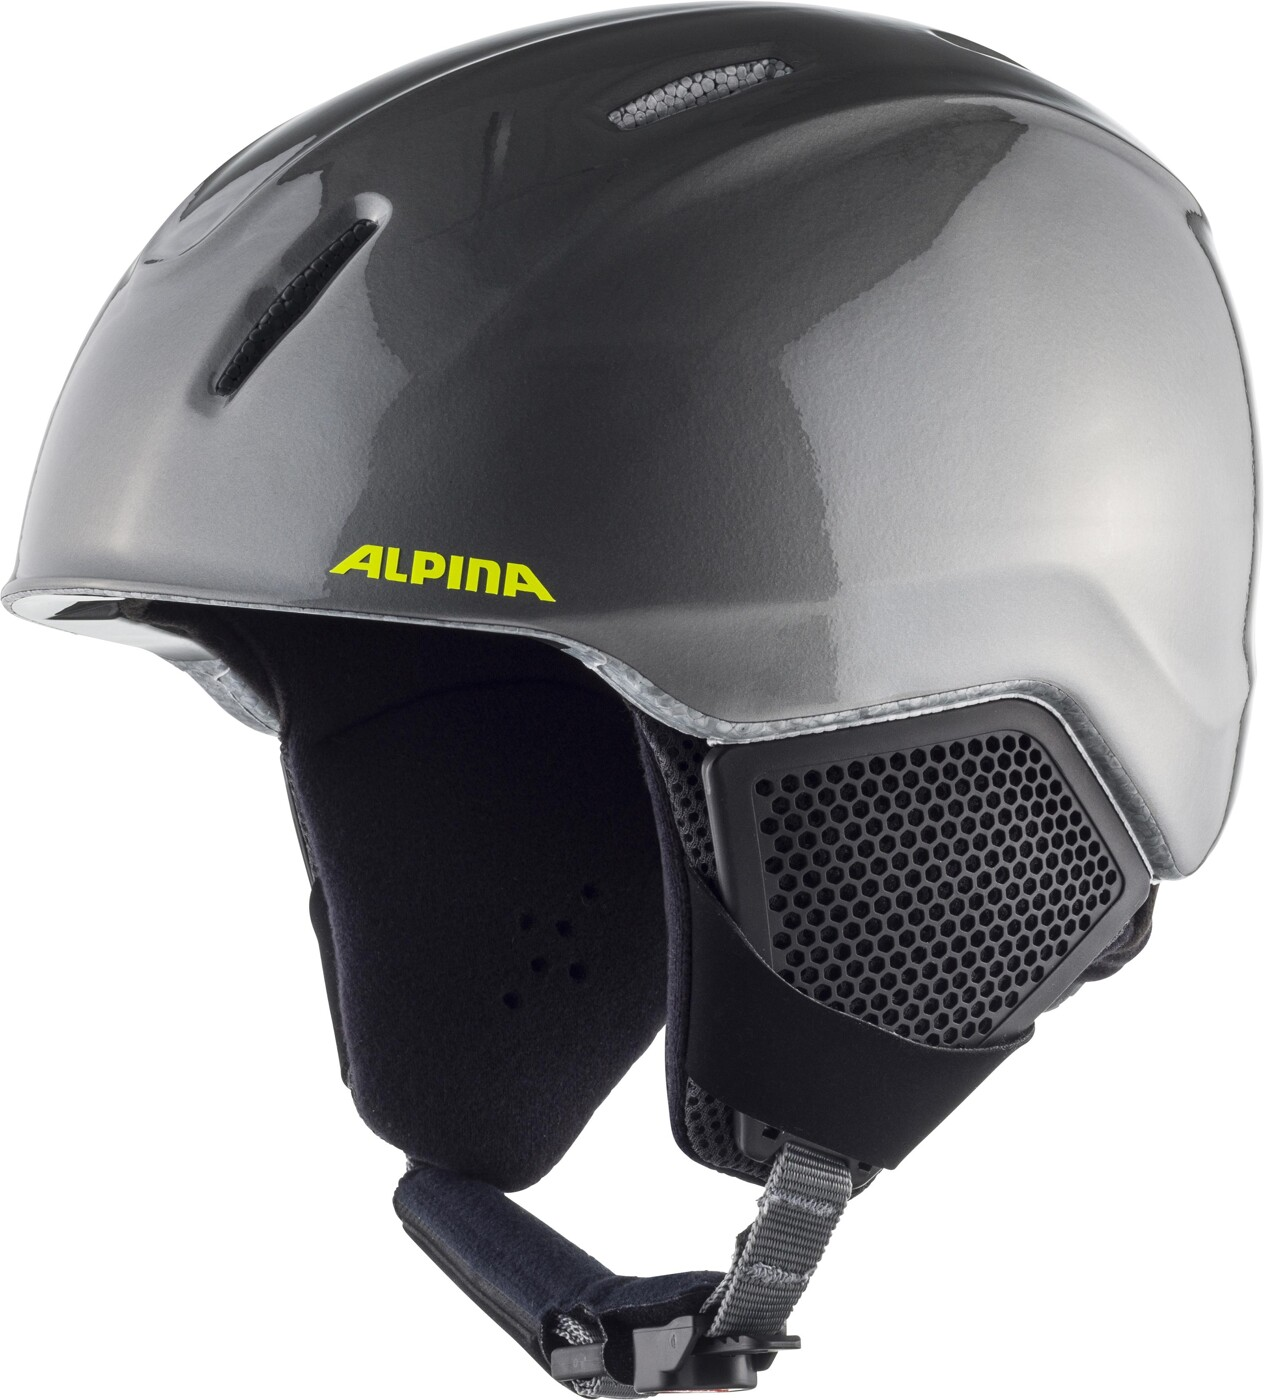 ALPINA Carat LX